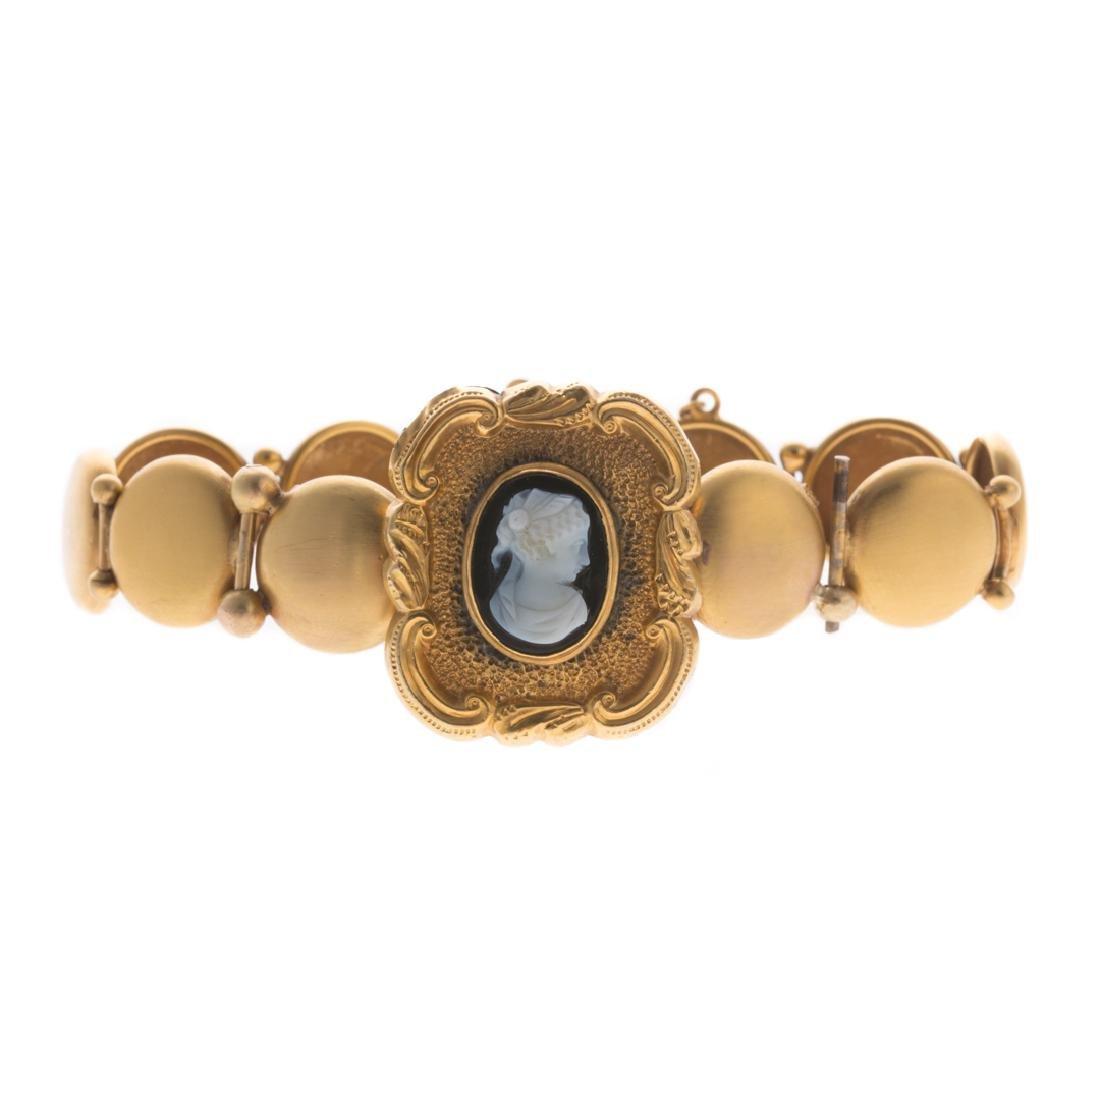 A Lady's Onyx Cameo Bracelet in Gold